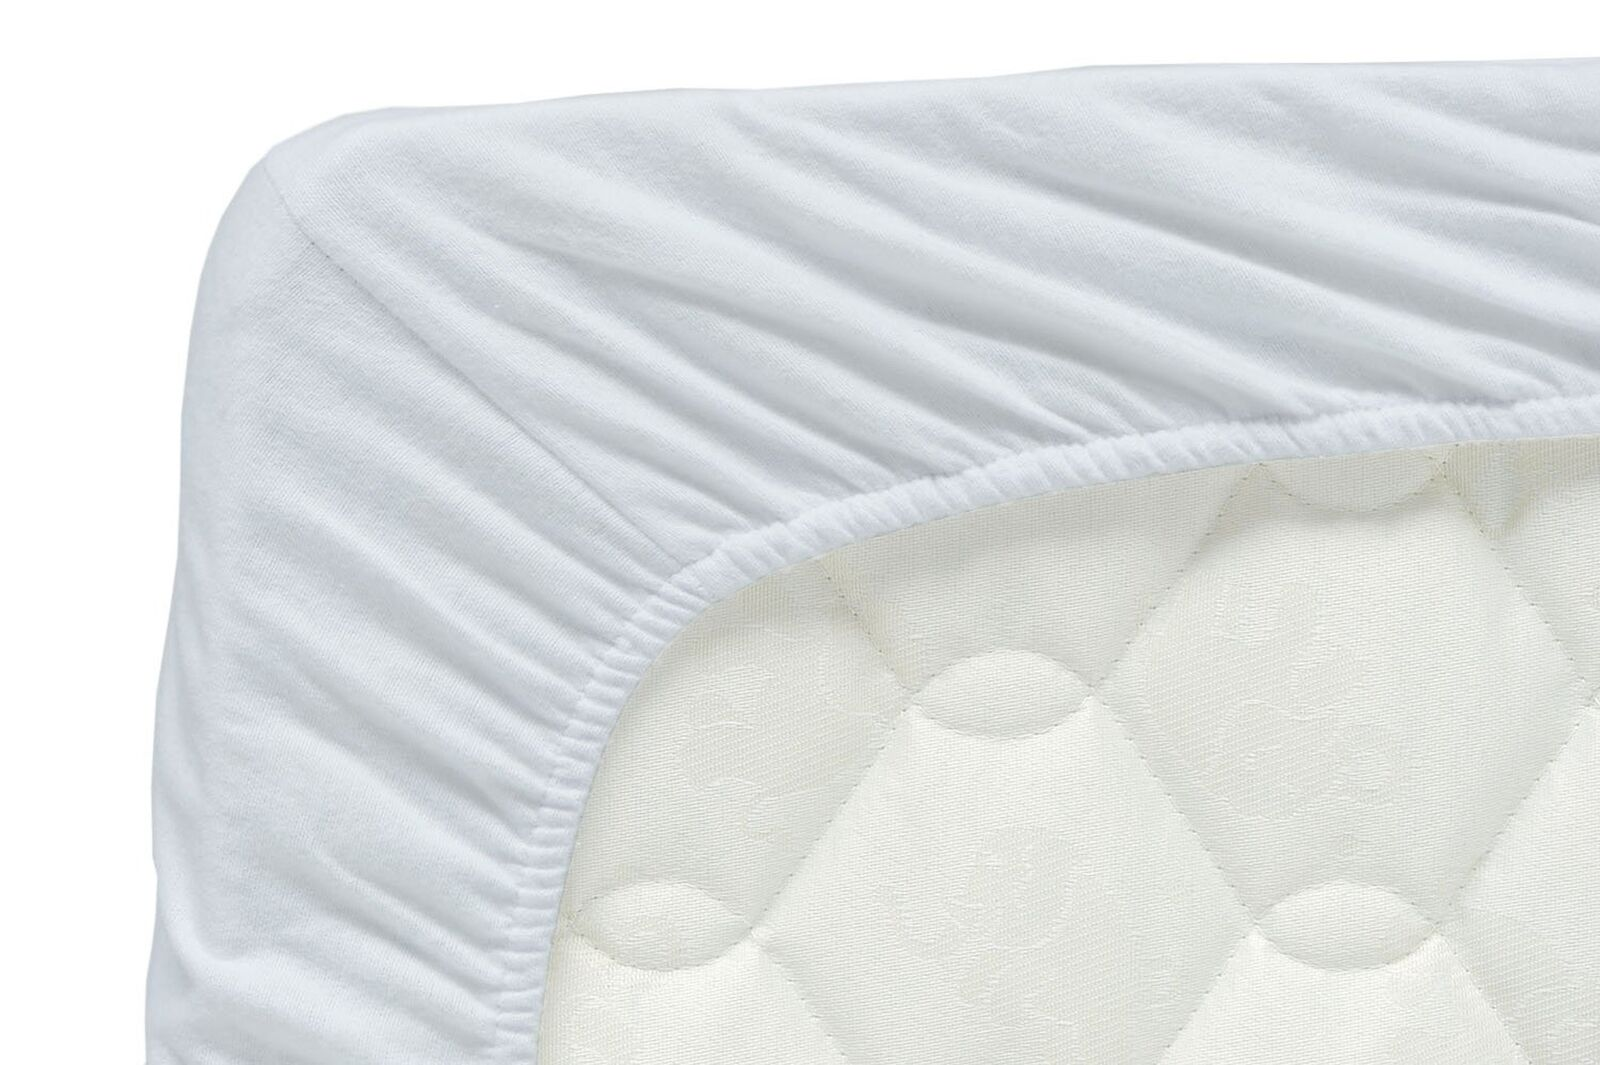 Briljant Home JHL160X220X00Jersey Stretch Fitted Sheet Cotton Weiß 160x 22...